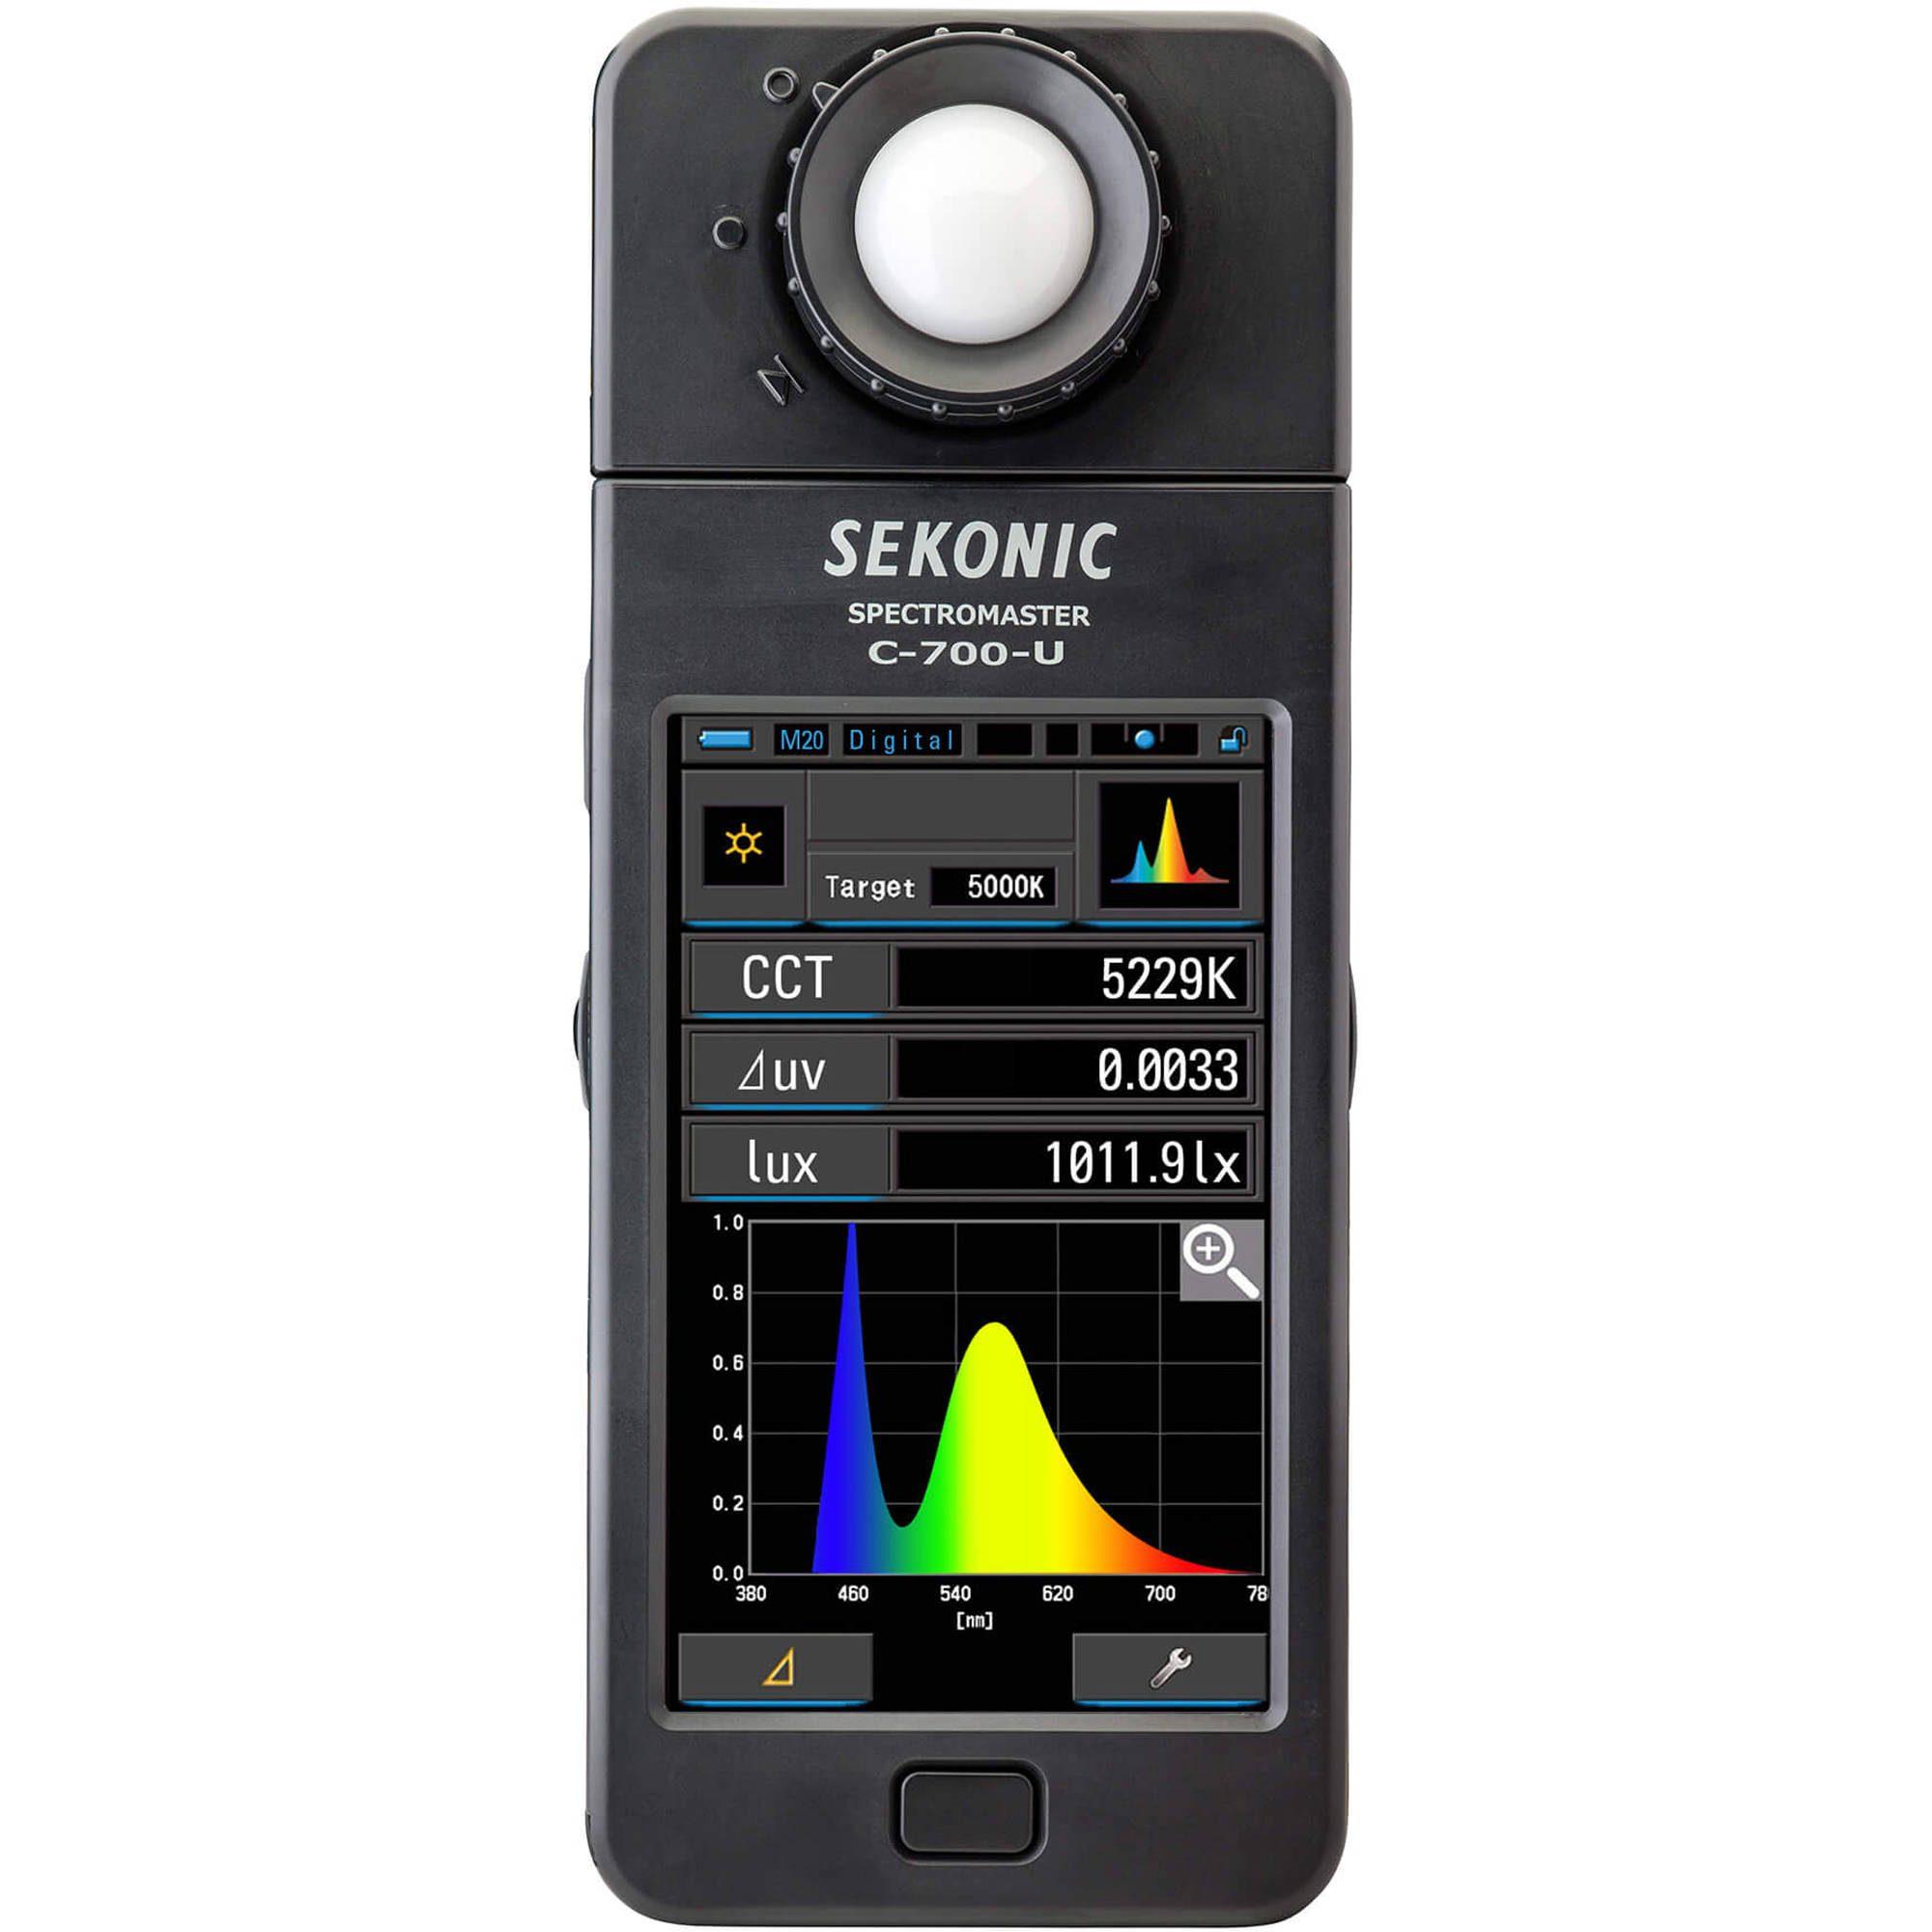 Sekonic C-800 SpectroMaster